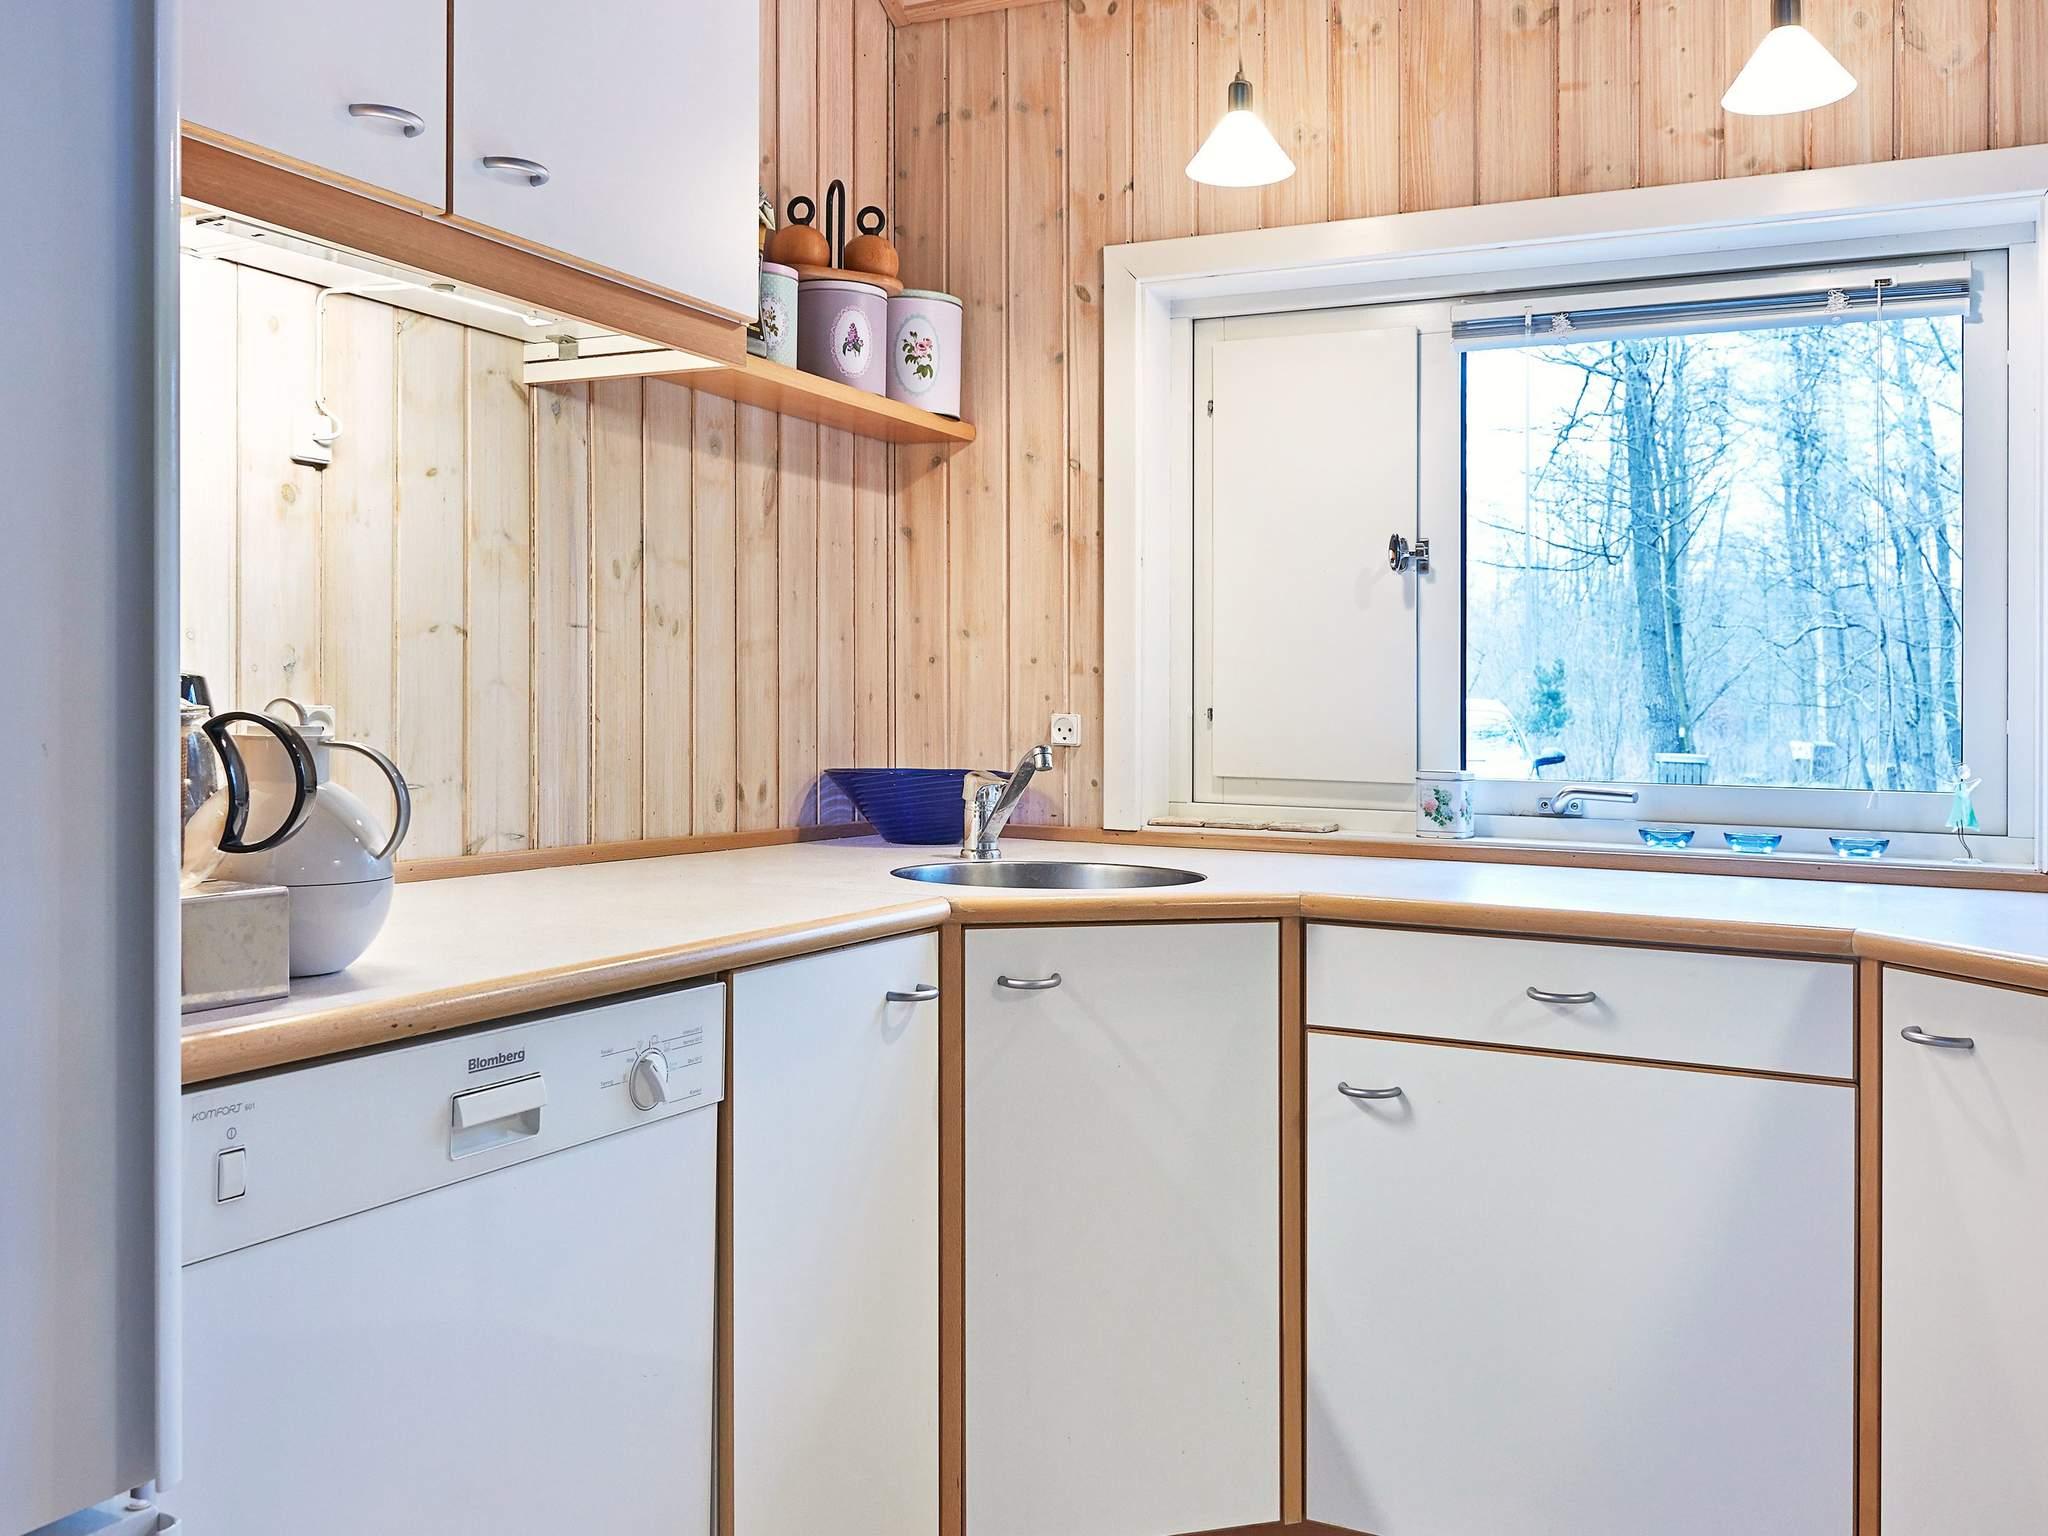 Ferienhaus Østre Sømarken (82542), Aakirkeby, , Bornholm, Dänemark, Bild 4